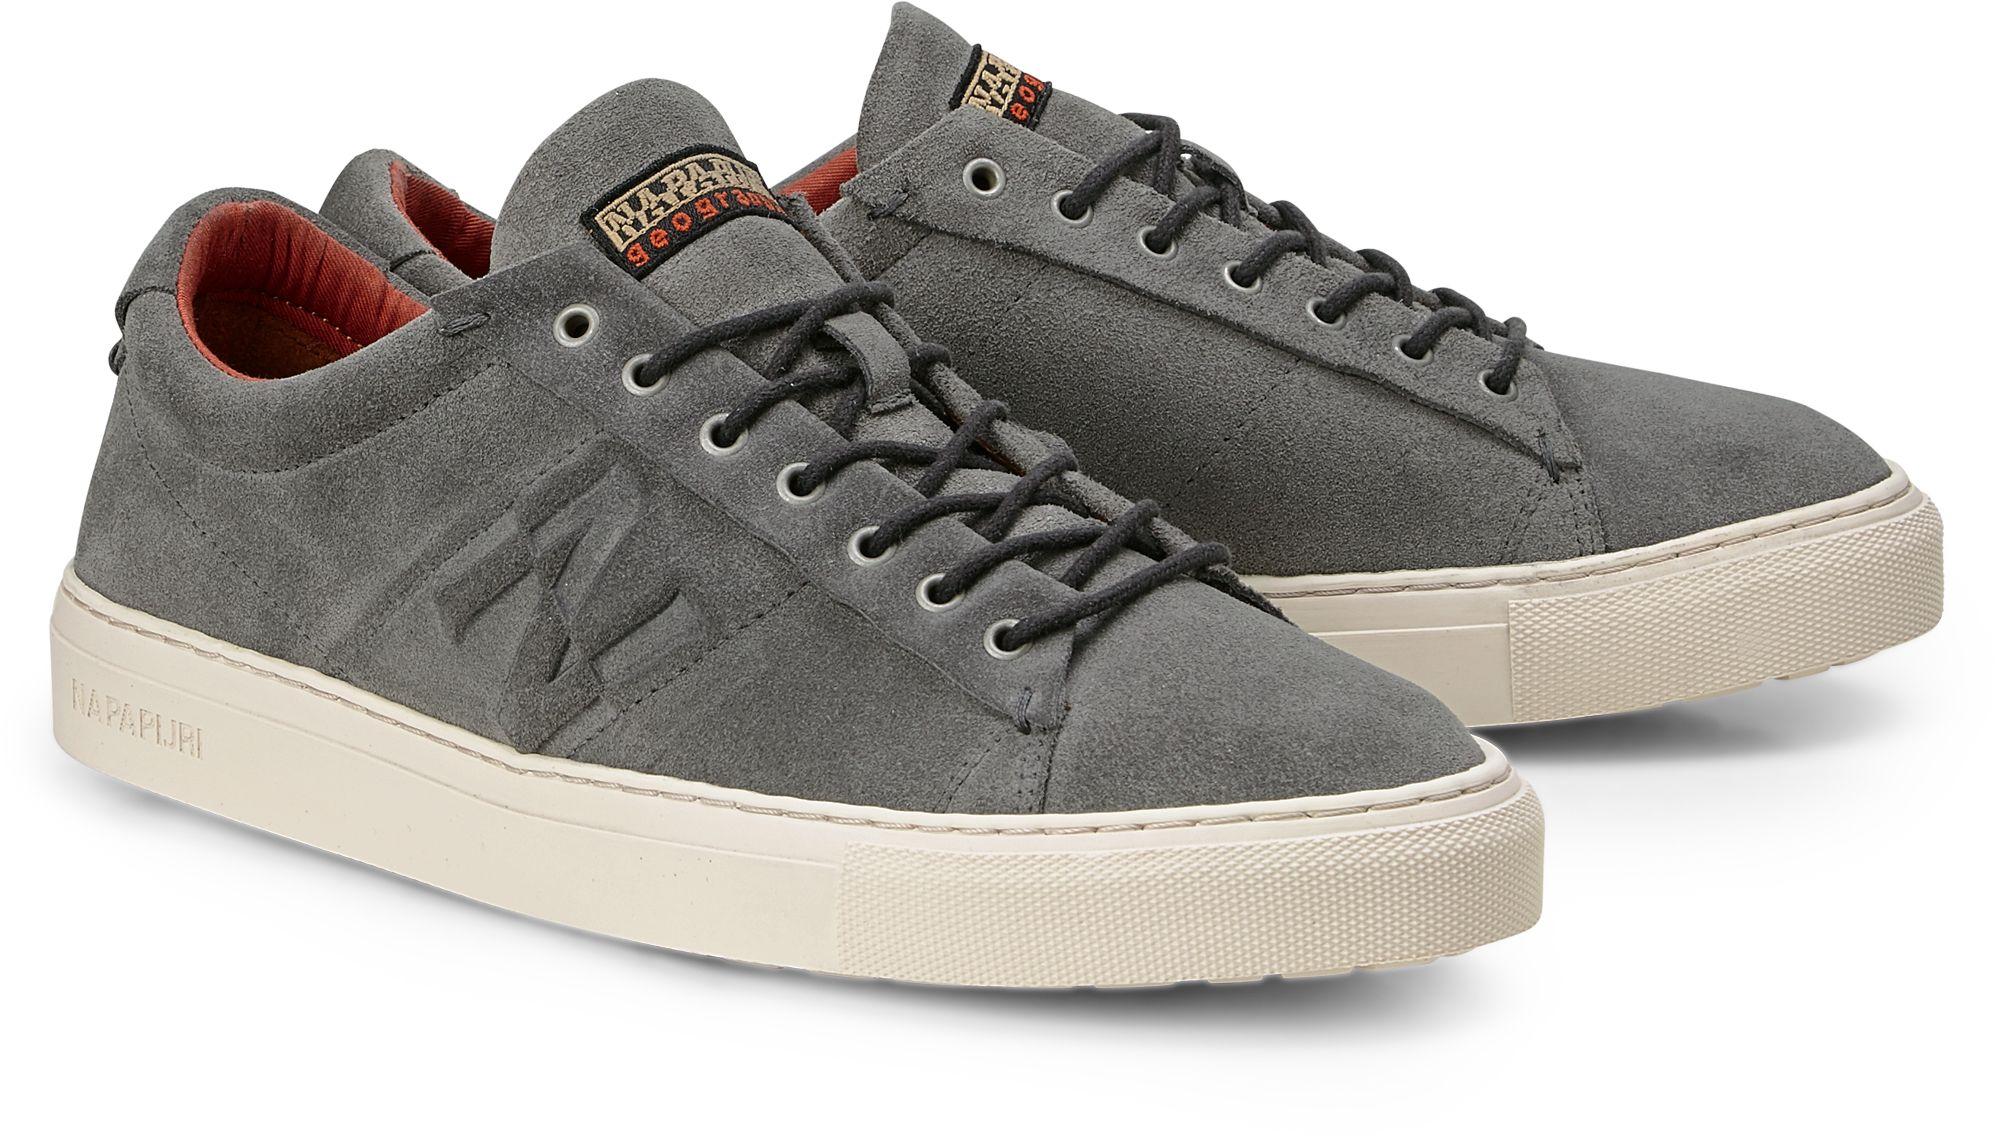 017565d0701a63 Leder Sneaker BEVER von Napapijri in grau dunkel für Herren. Gr.  41